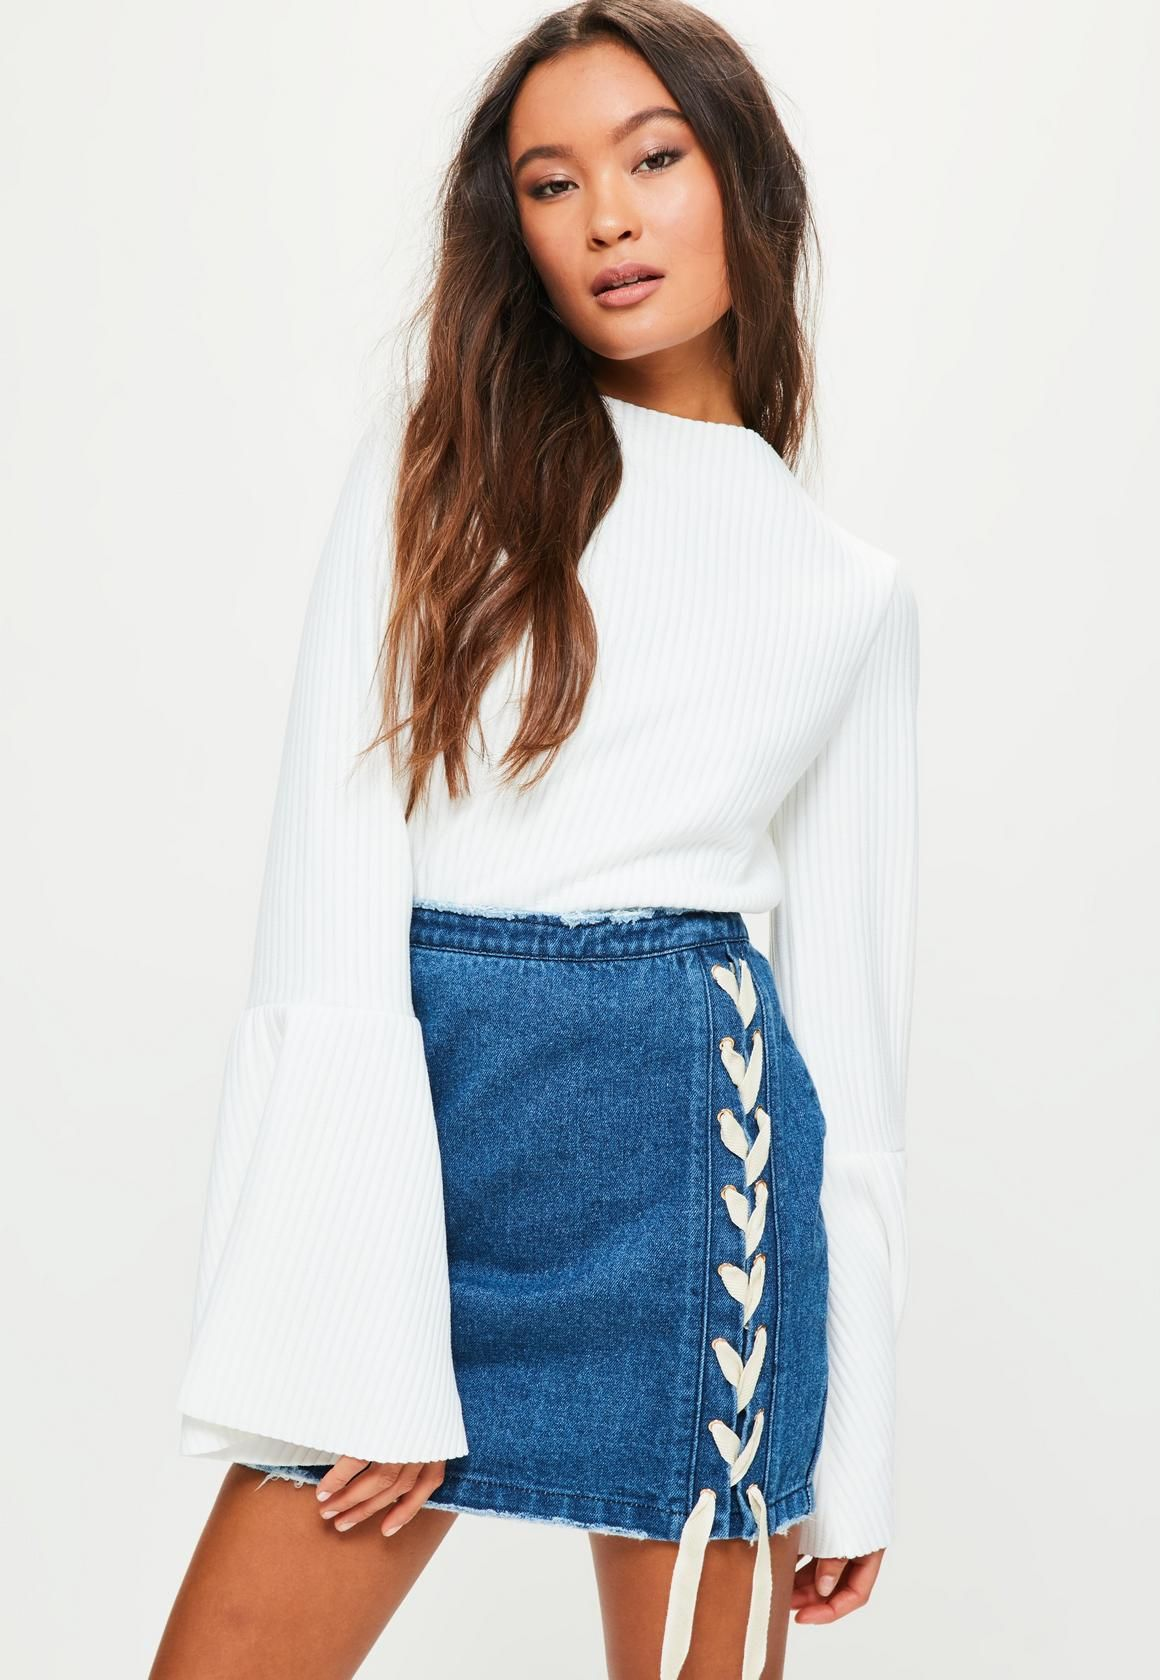 b9d3620cb9 Missguided - Petite Blue Lace Up Front Denim Skirt | stuff i like ...